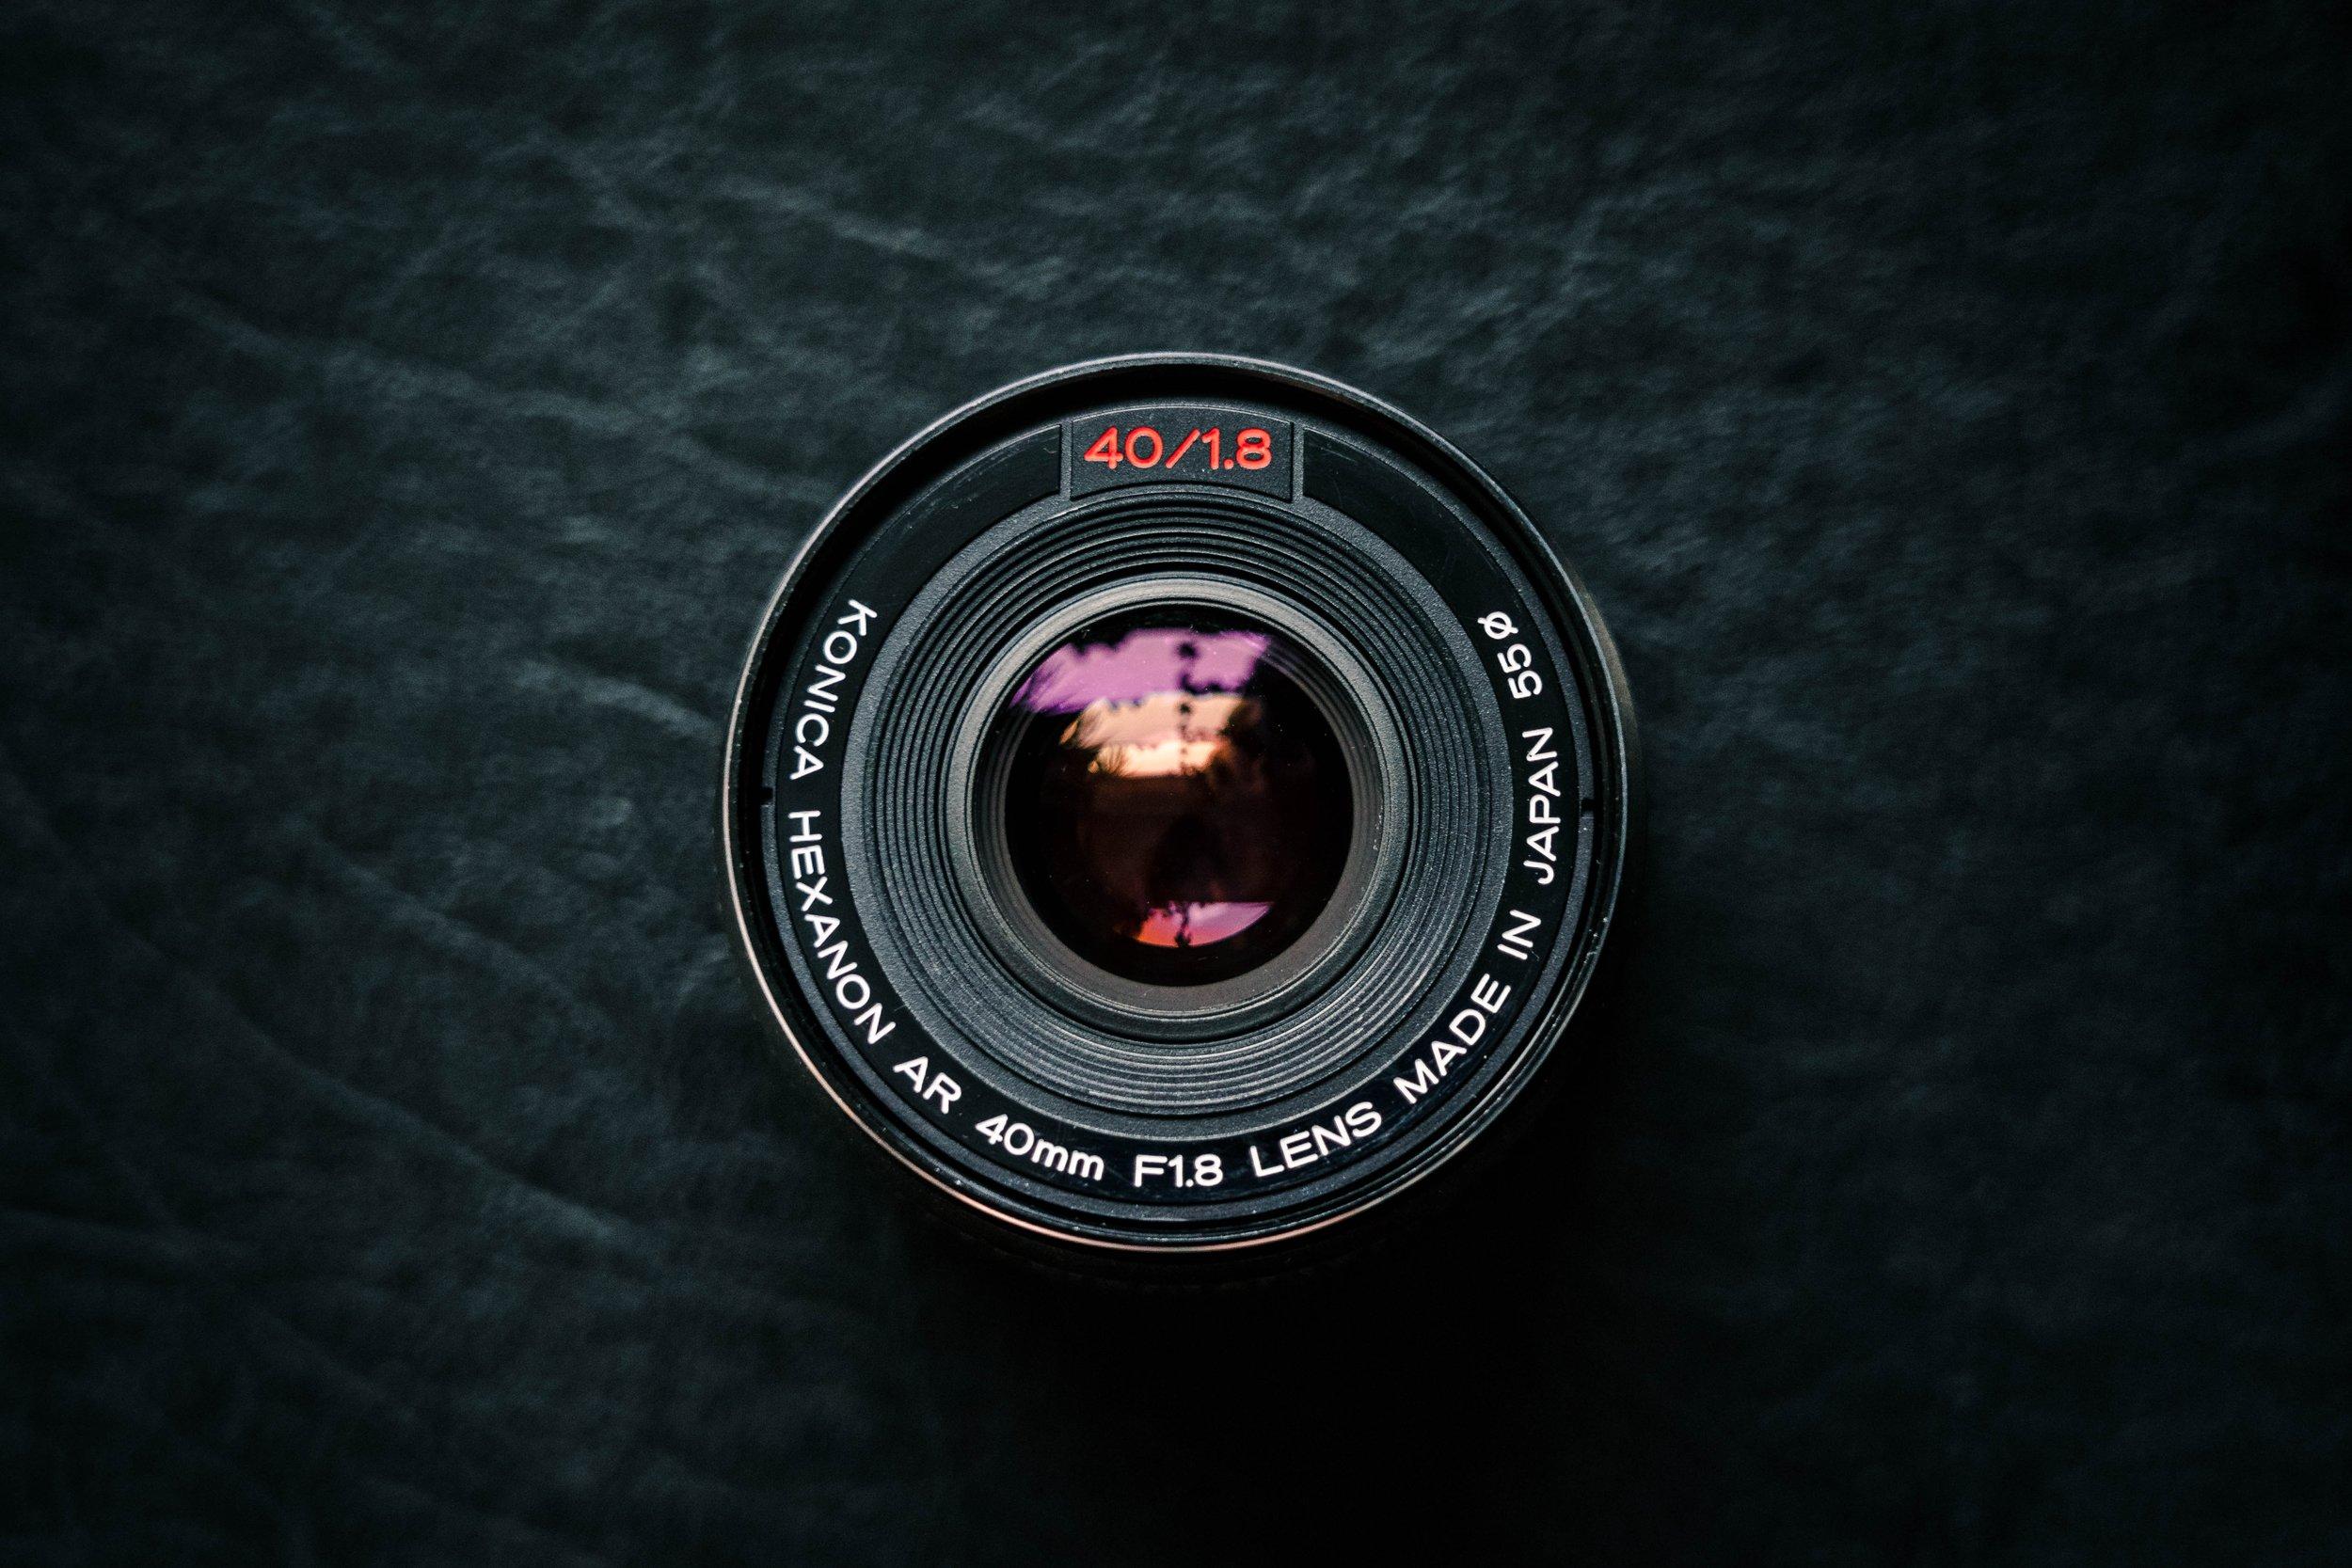 camera-lens-electronics-equipment-1707728.jpg